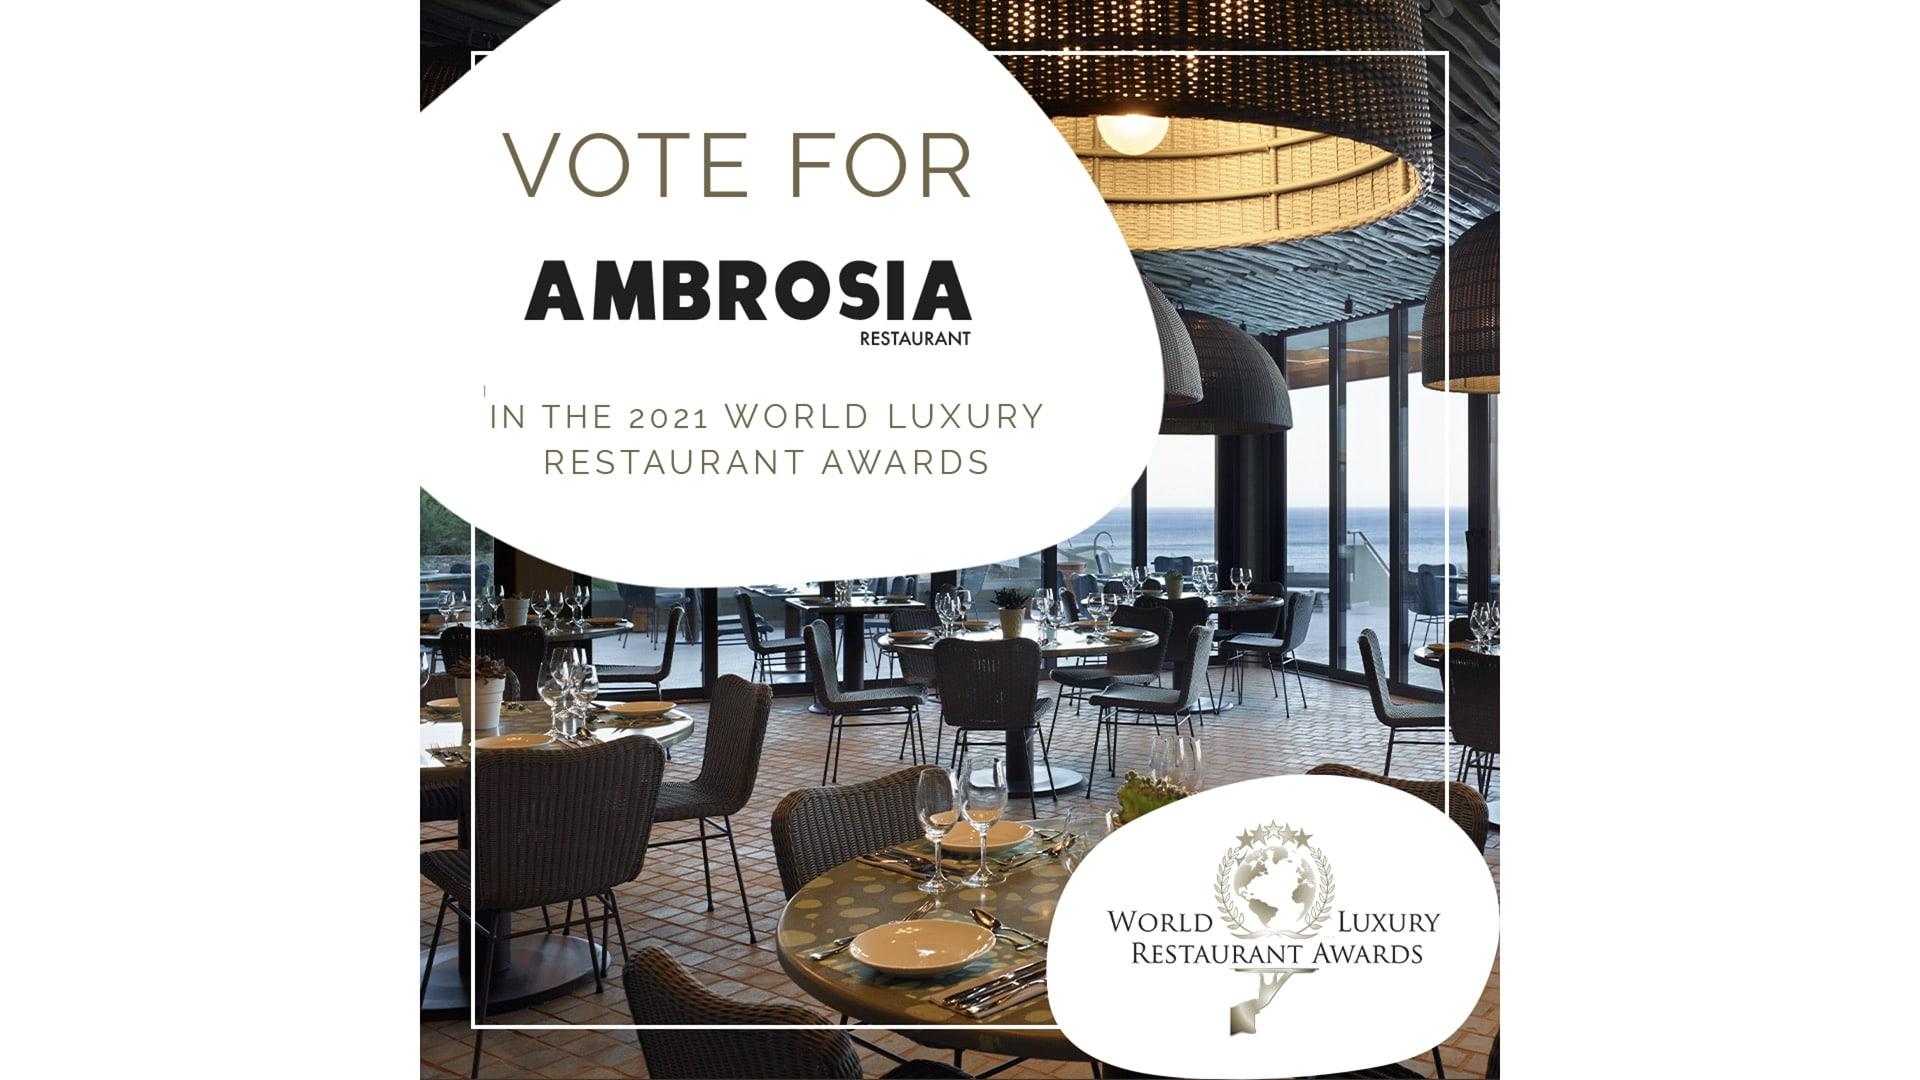 Luxury Restaurant Award Nomination for Cayo's Ambrosia Buffet Restaurant